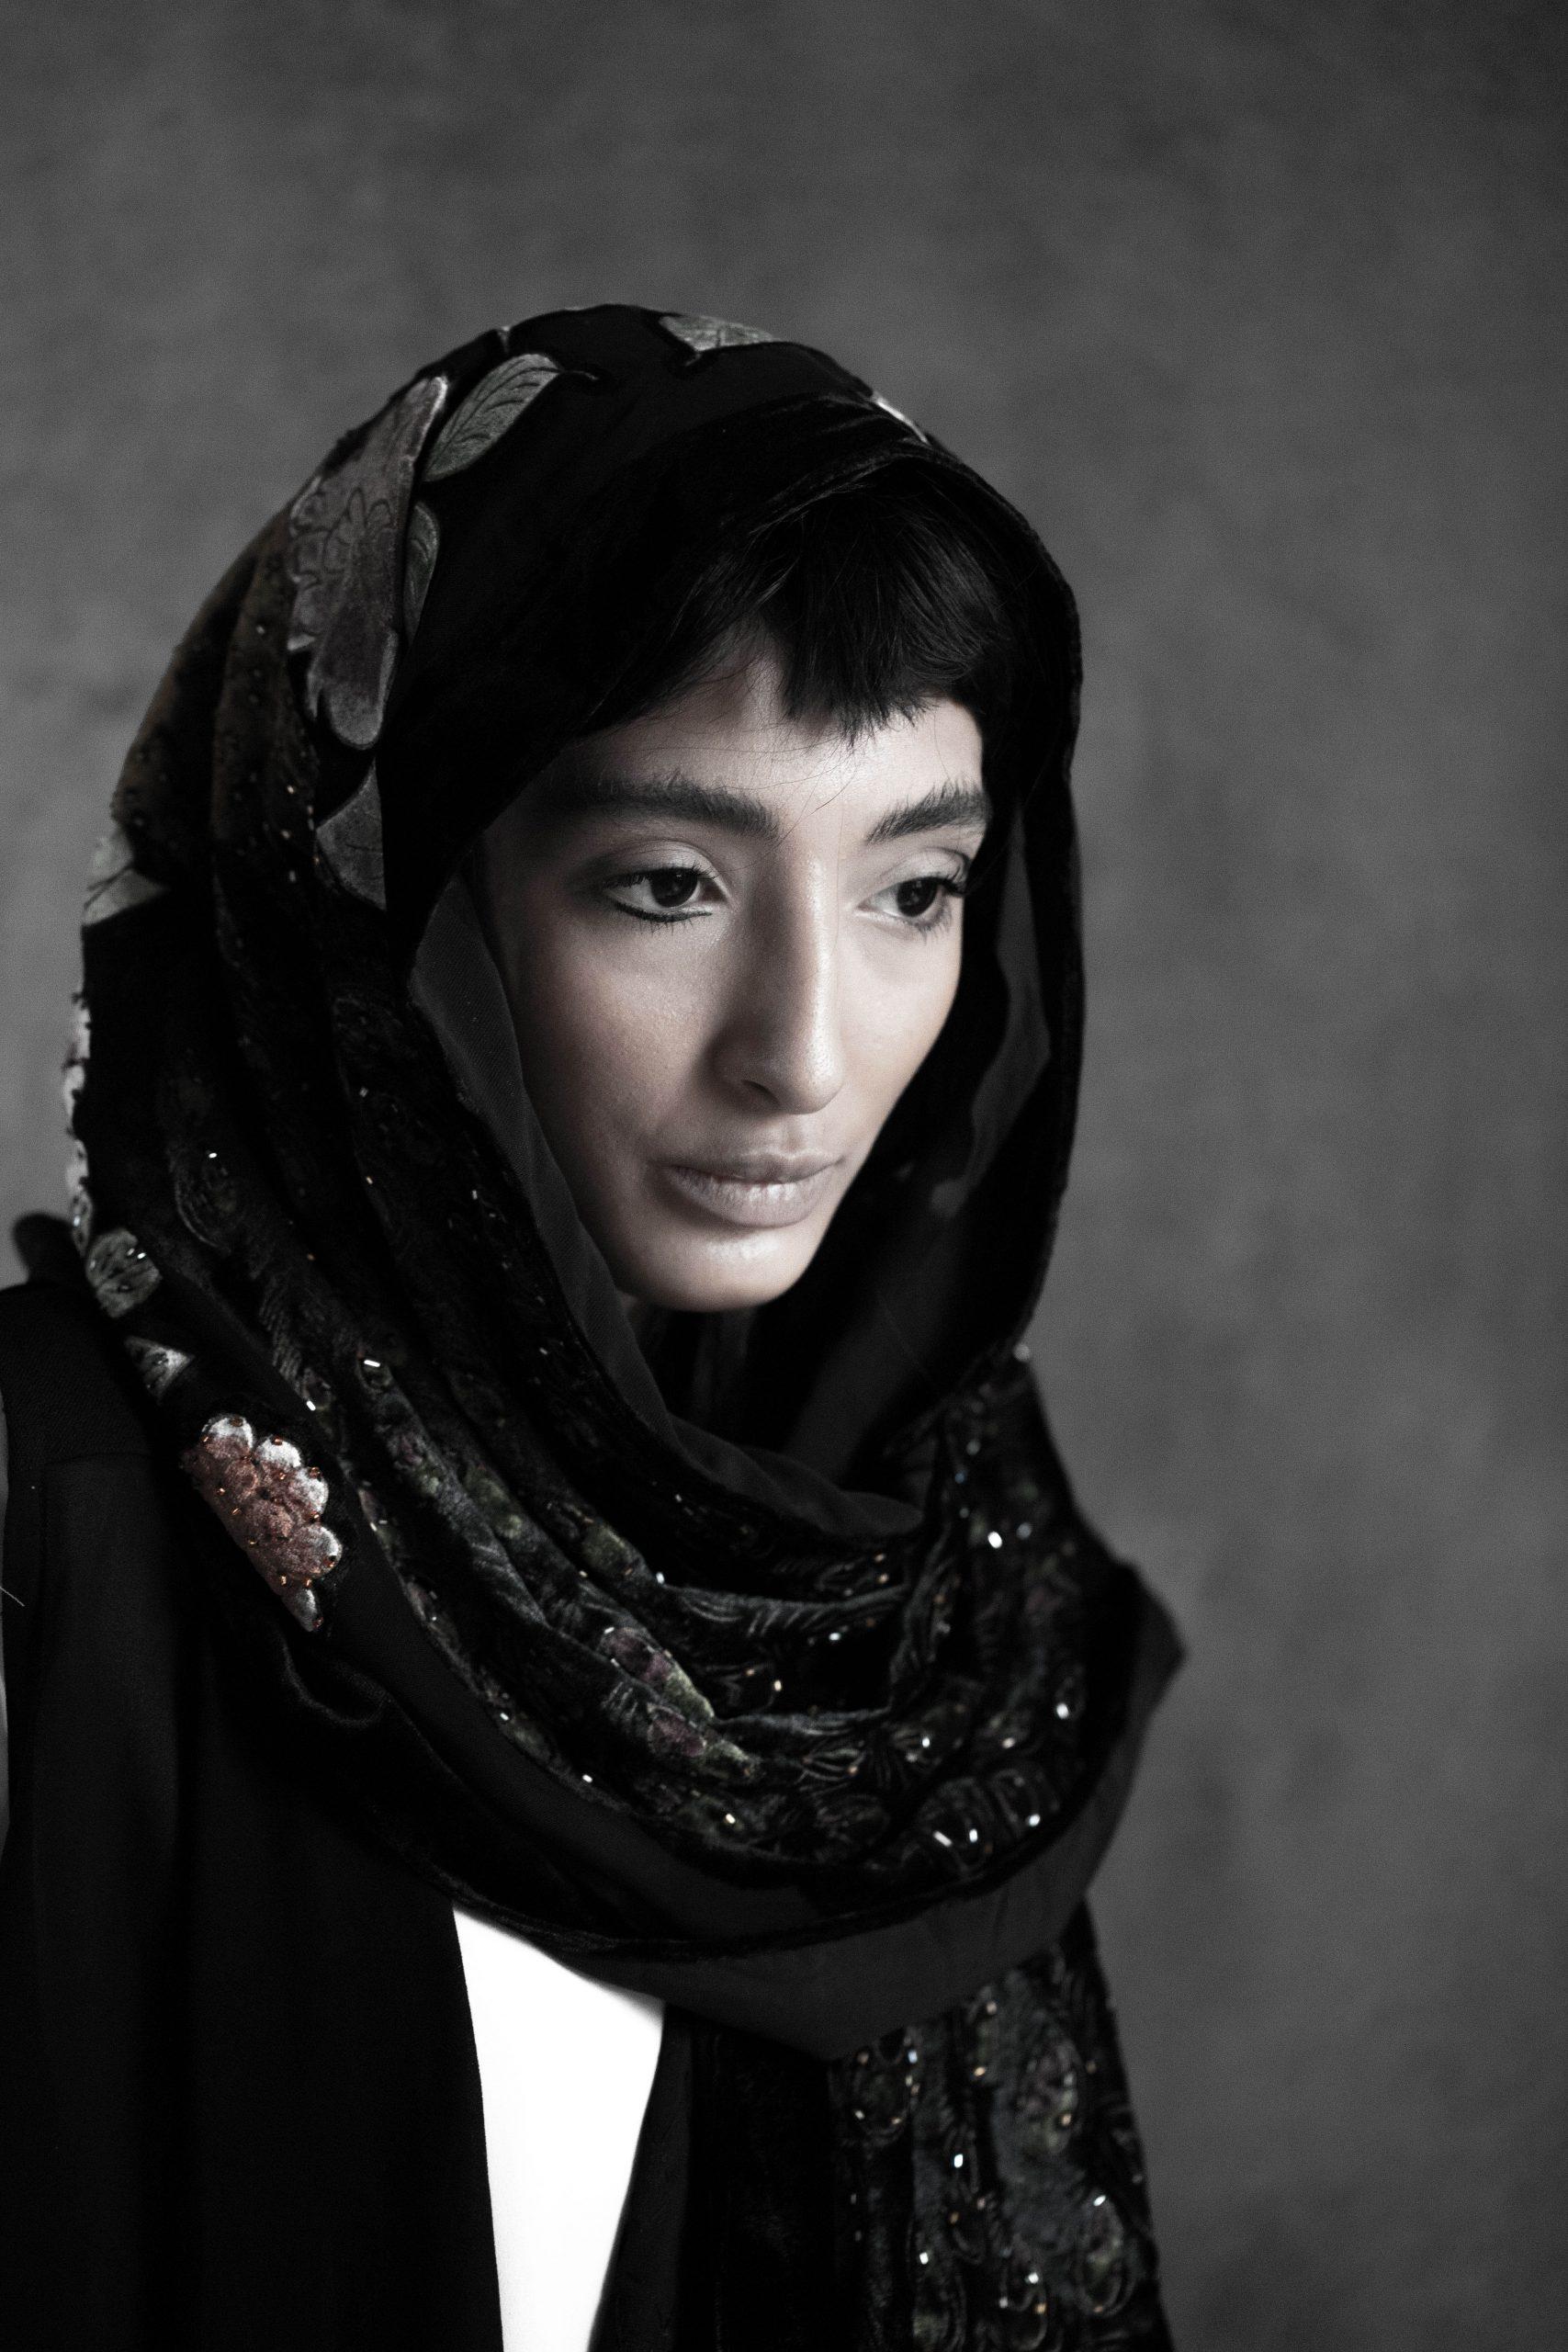 Categorie: Portrait - Art Director, Photographer & retoucher : ARLEN KESHISHIAN - Location: Armenia